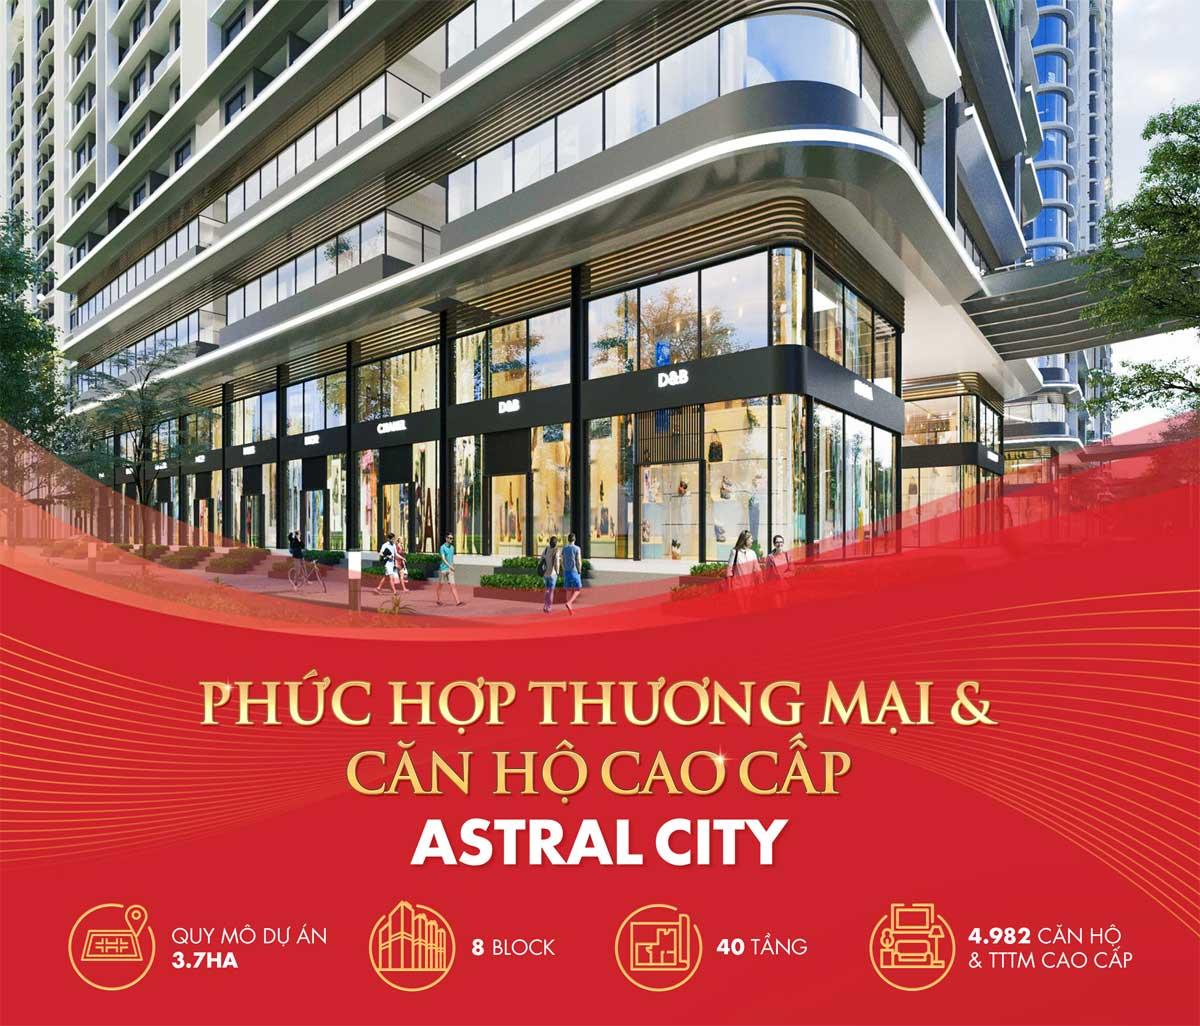 trung tam thuong mai cao cap tai astral city - ASTRAL CITY